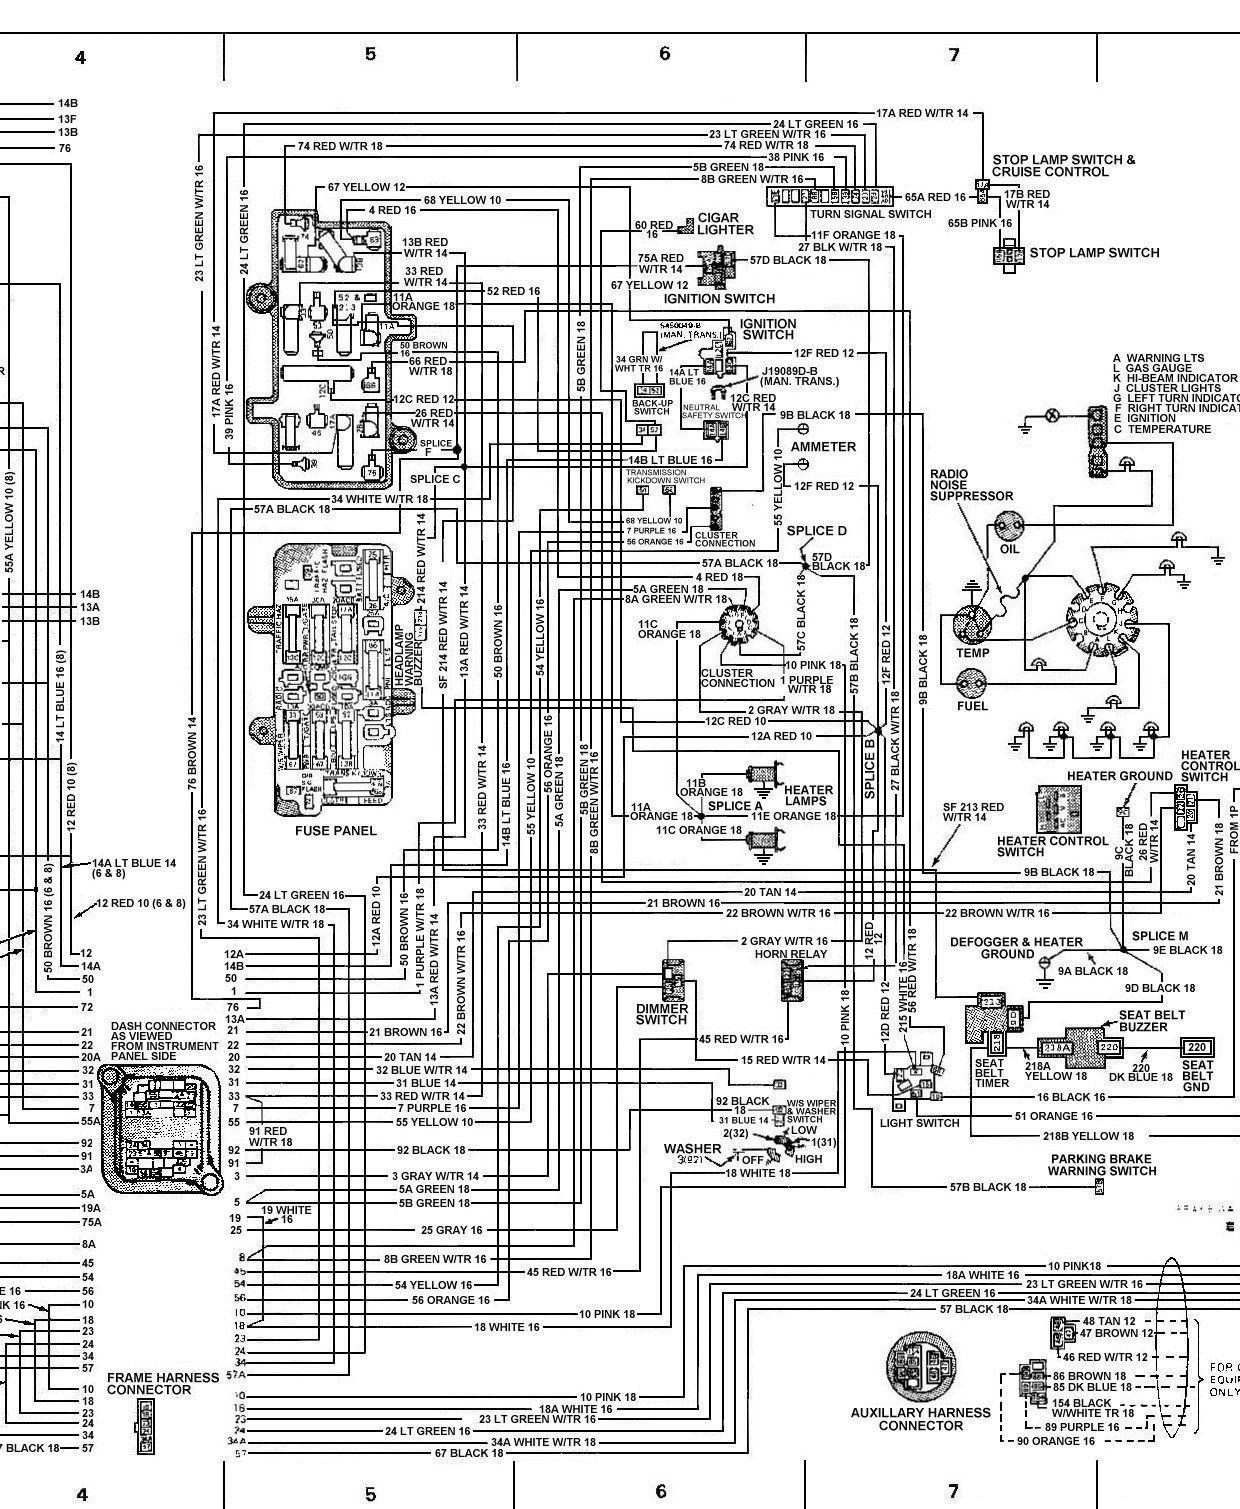 1978 Vw Super Beetle Convertible Diagram